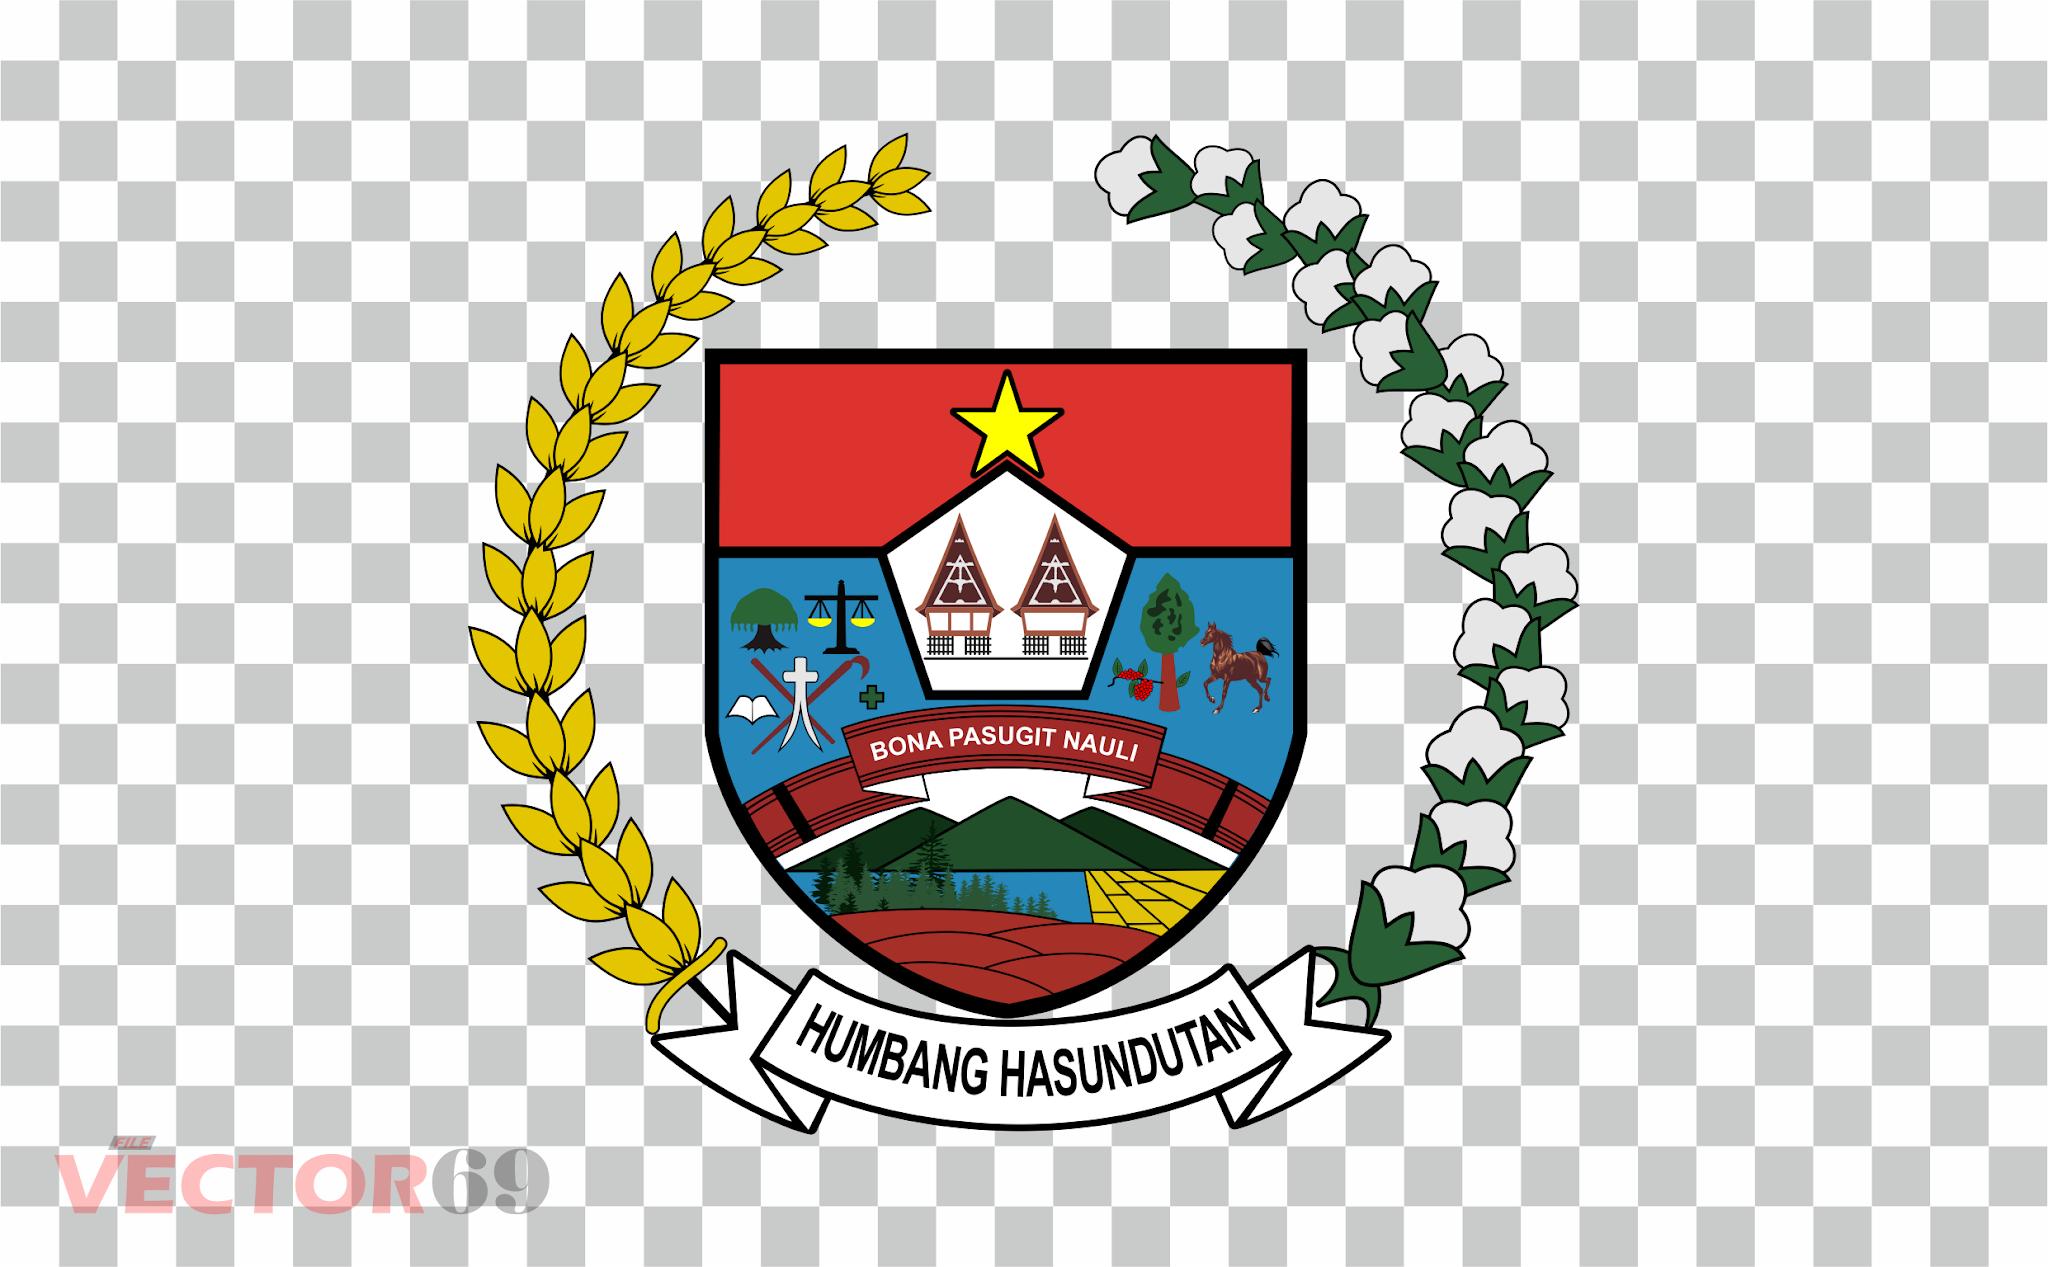 Kabupaten Humbang Hasundutan Logo - Download Vector File PNG (Portable Network Graphics)